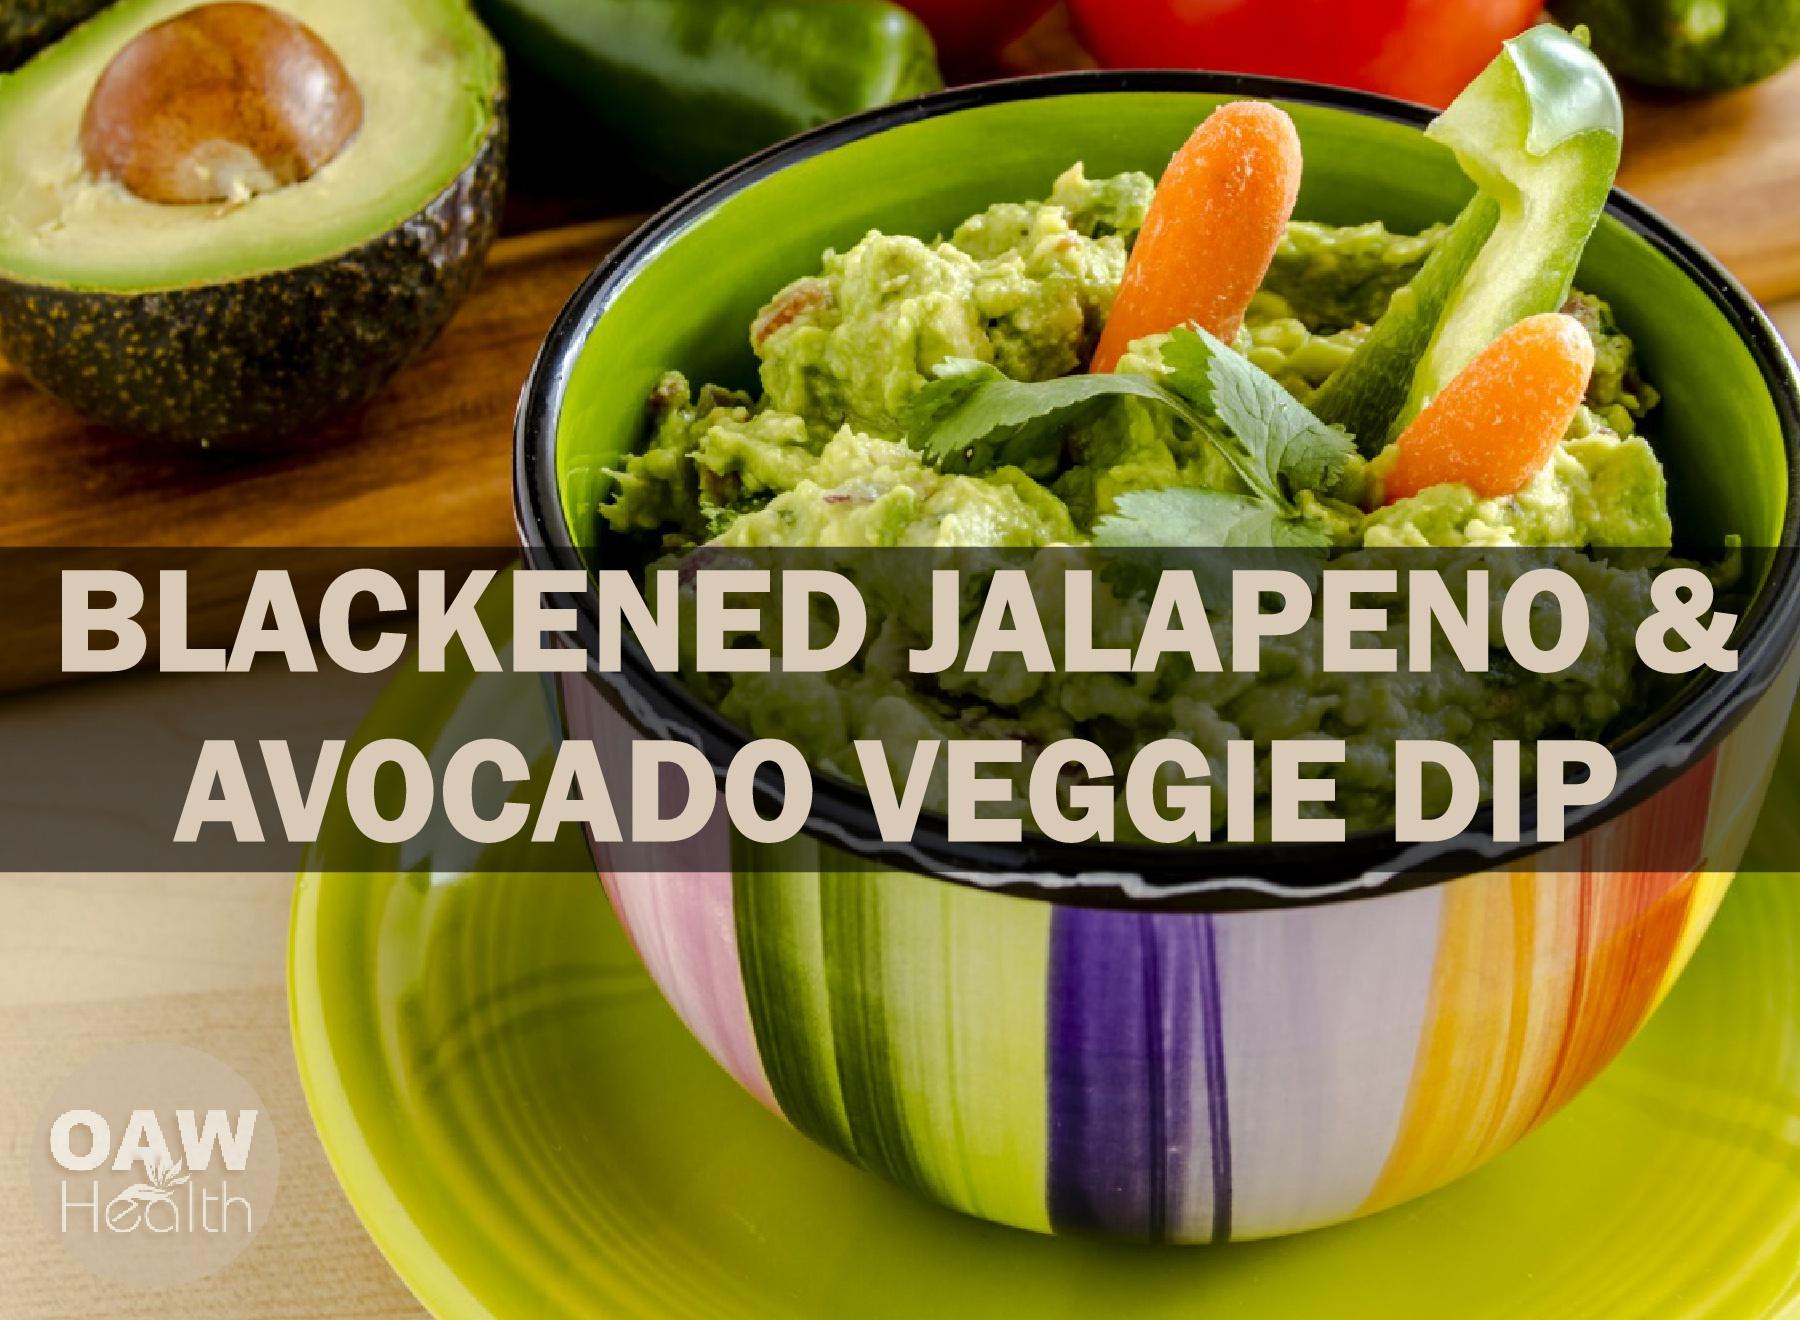 Best Blackened Jalapeno and Avocado Veggie Dip